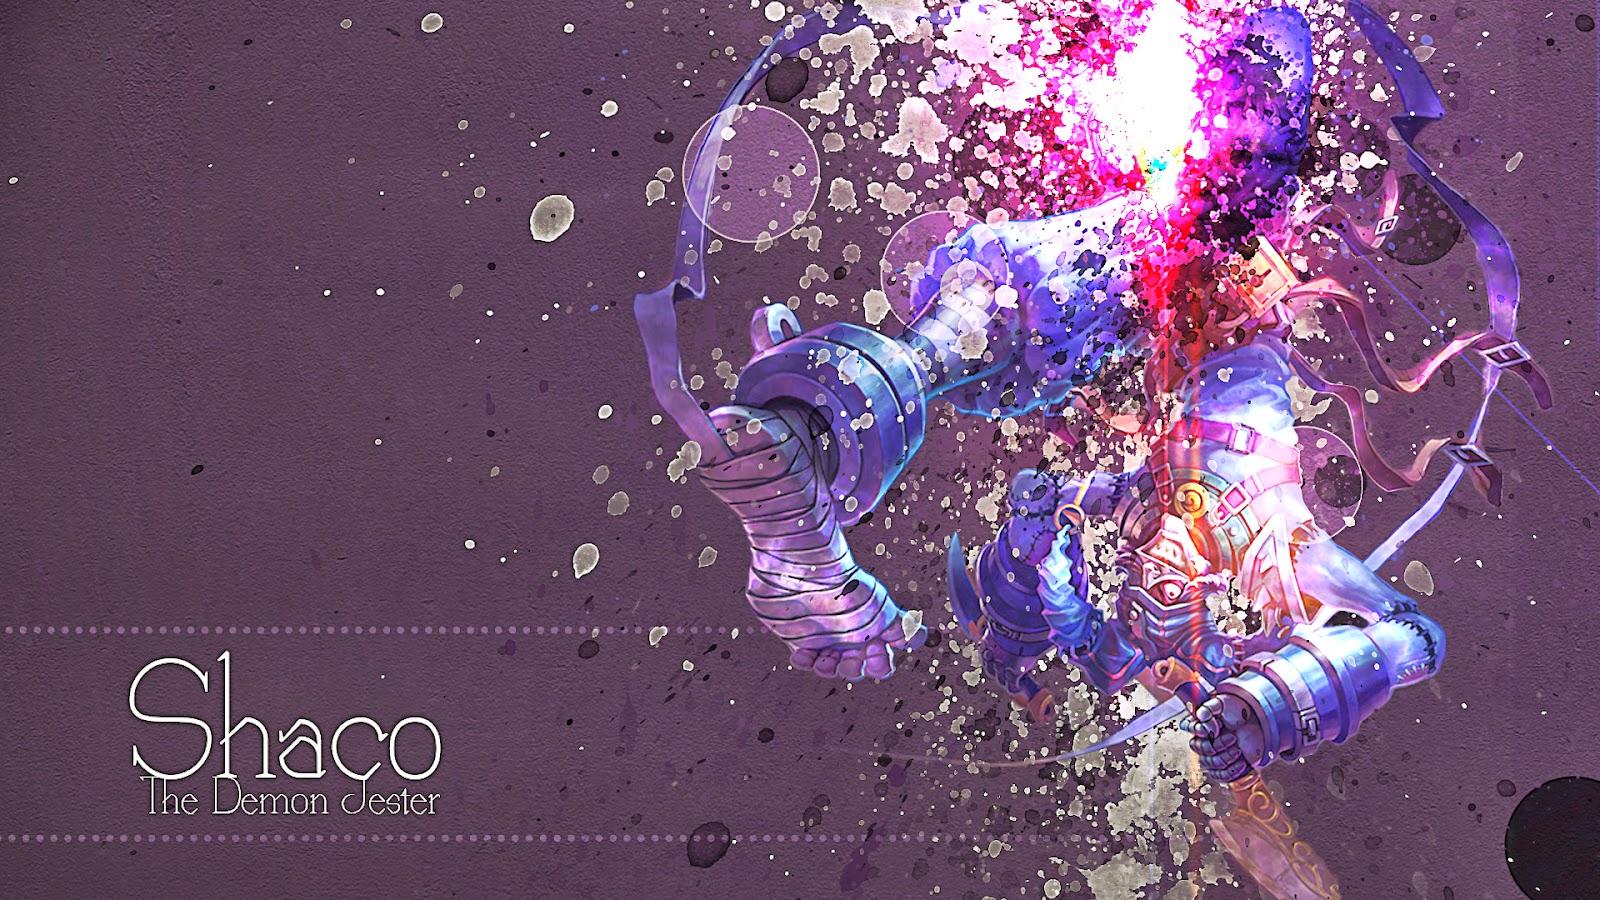 Shaco League of Legends Wallpaper, Shaco Desktop Wallpaper